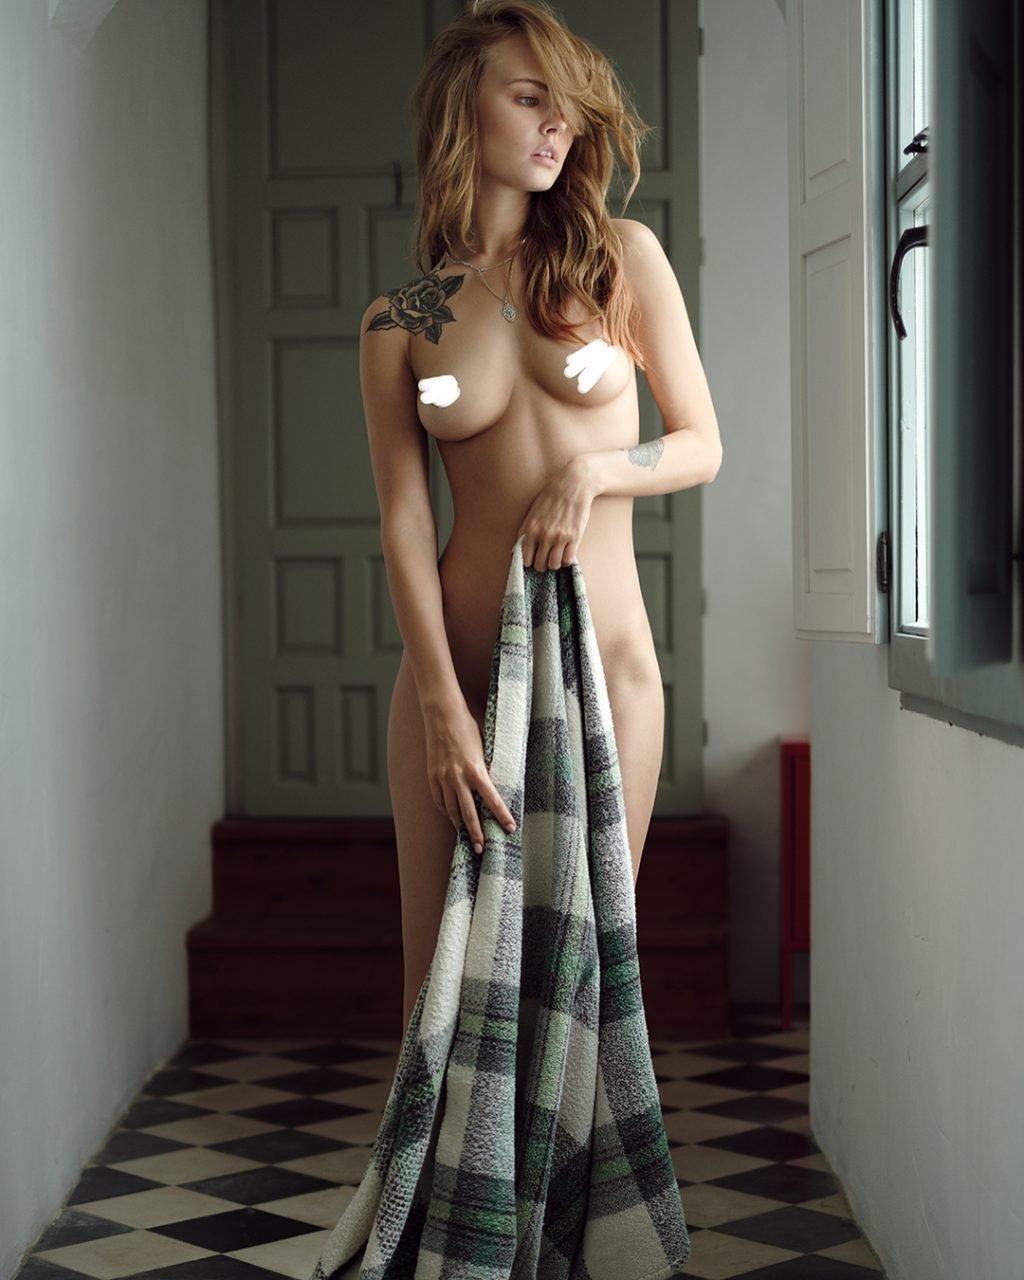 Anastasiya Scheglova Nude & Sexy (11 Hot Photos)